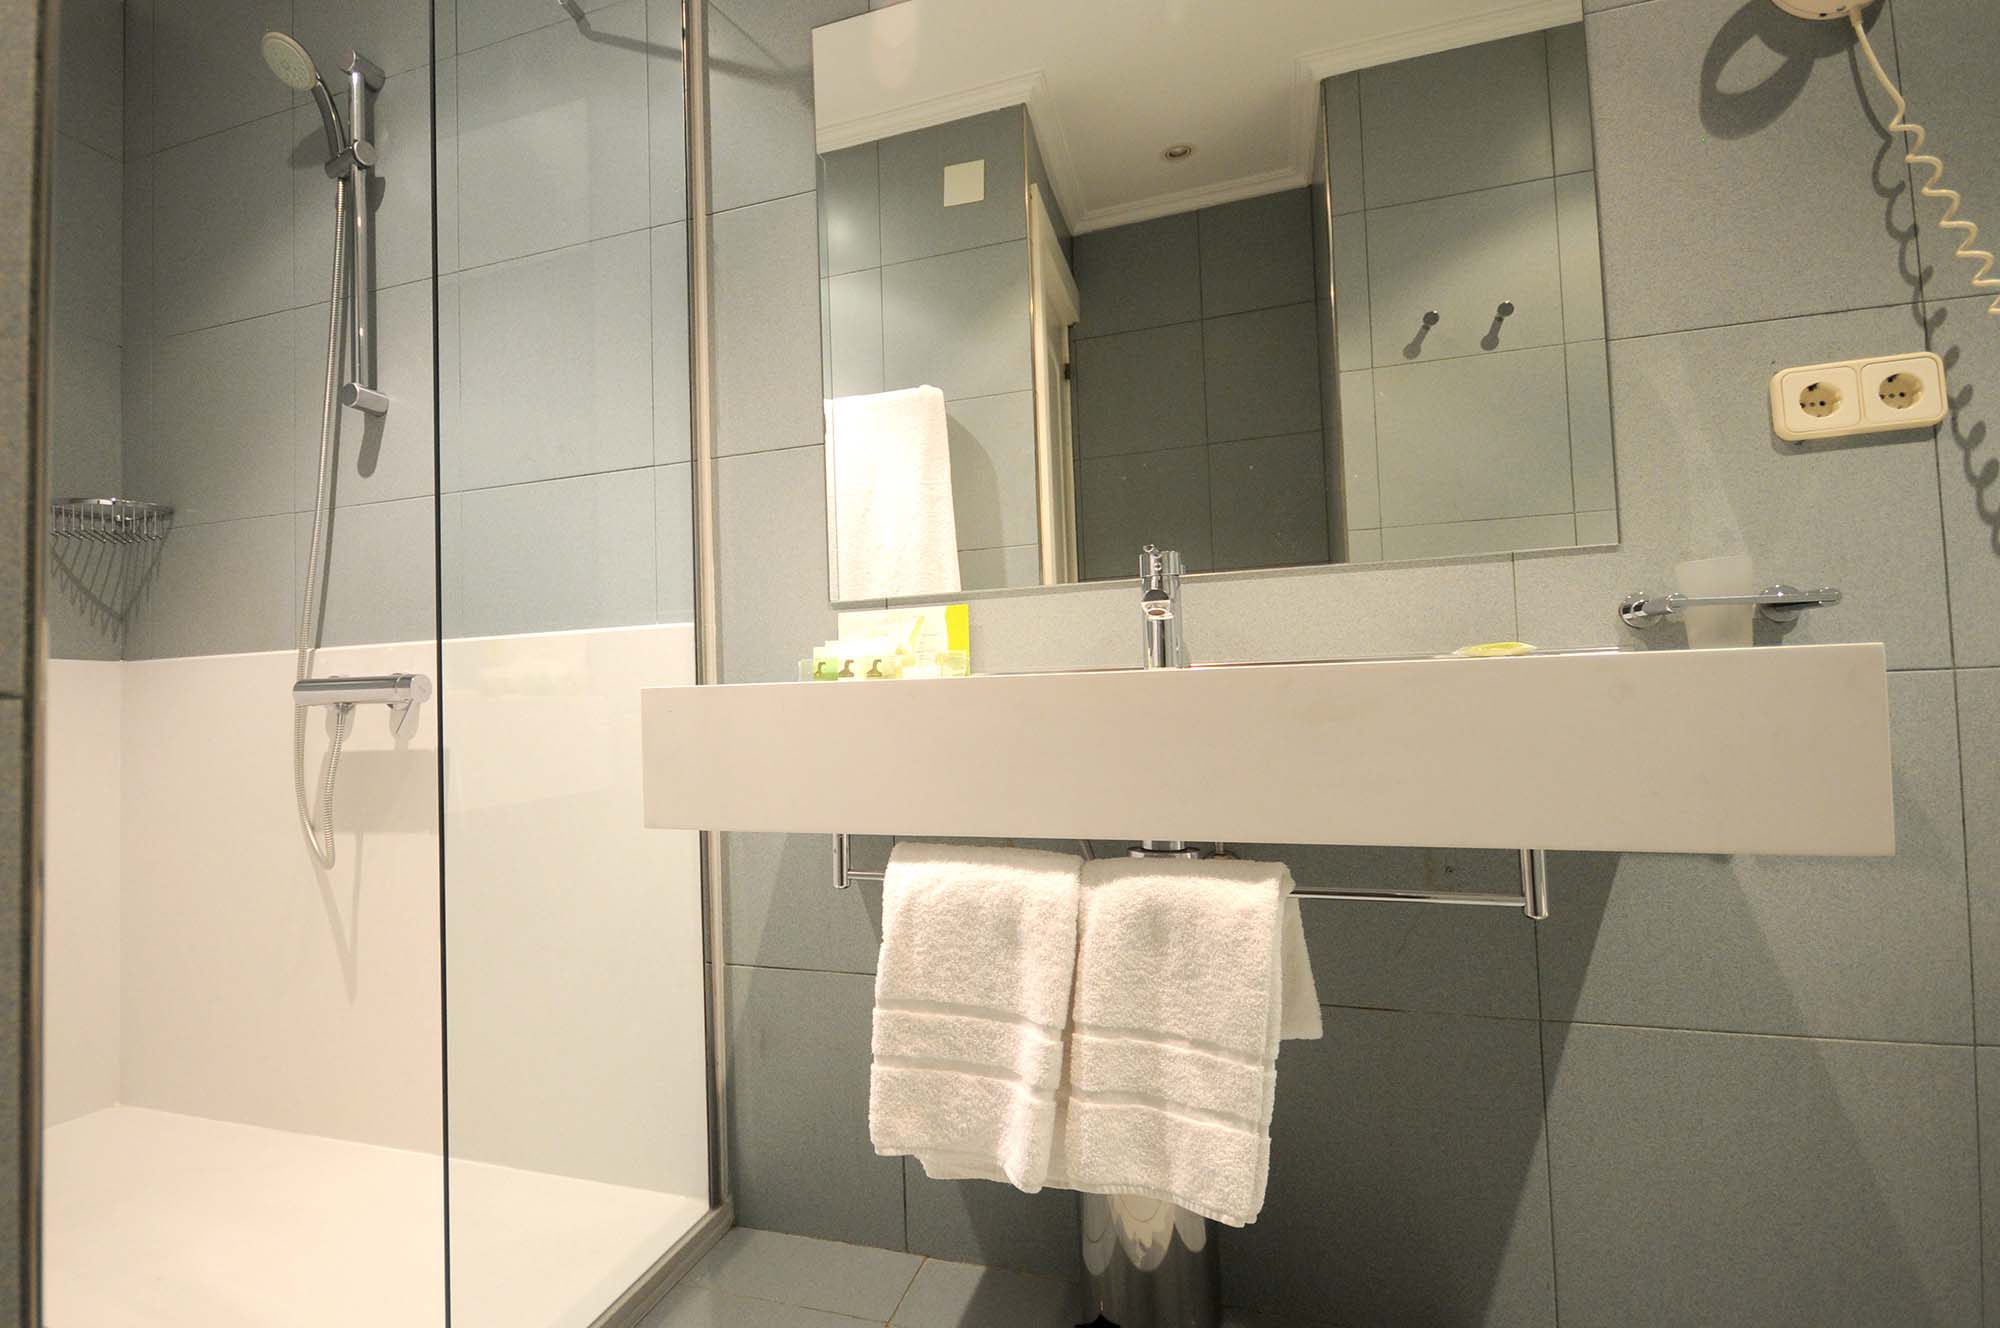 Cambio Bañera por Ducha de DuchaYa en Donosti Hotel Niza 4